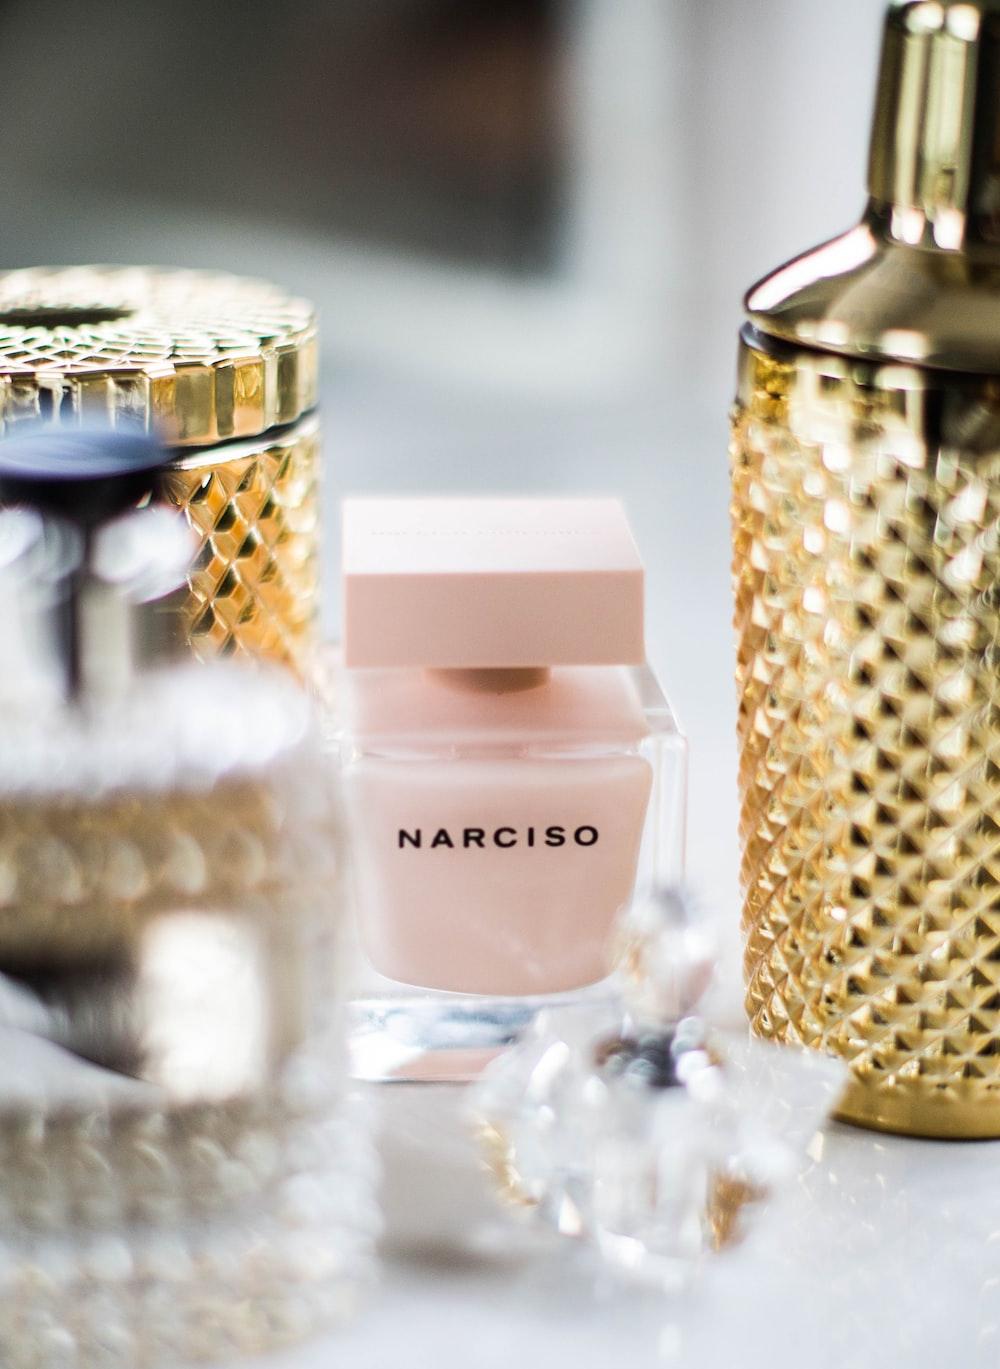 Narciso perfume bottle